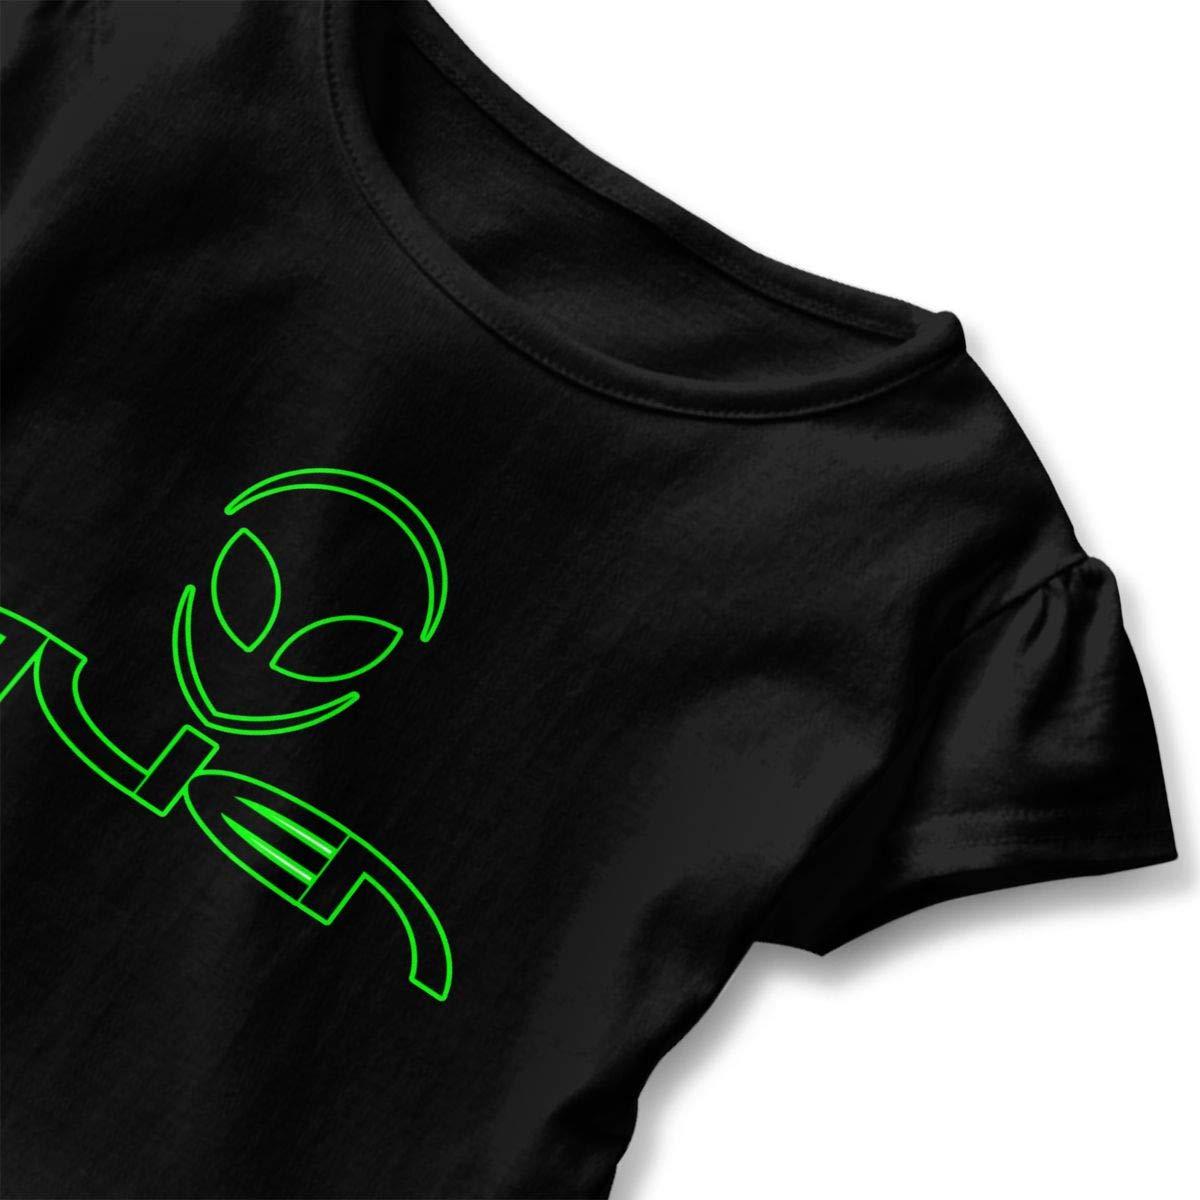 JVNSS Alien-Logo Shirt Design Infant Girl Flounced T Shirts Graphic T-Shirt for 2-6T Baby Girls